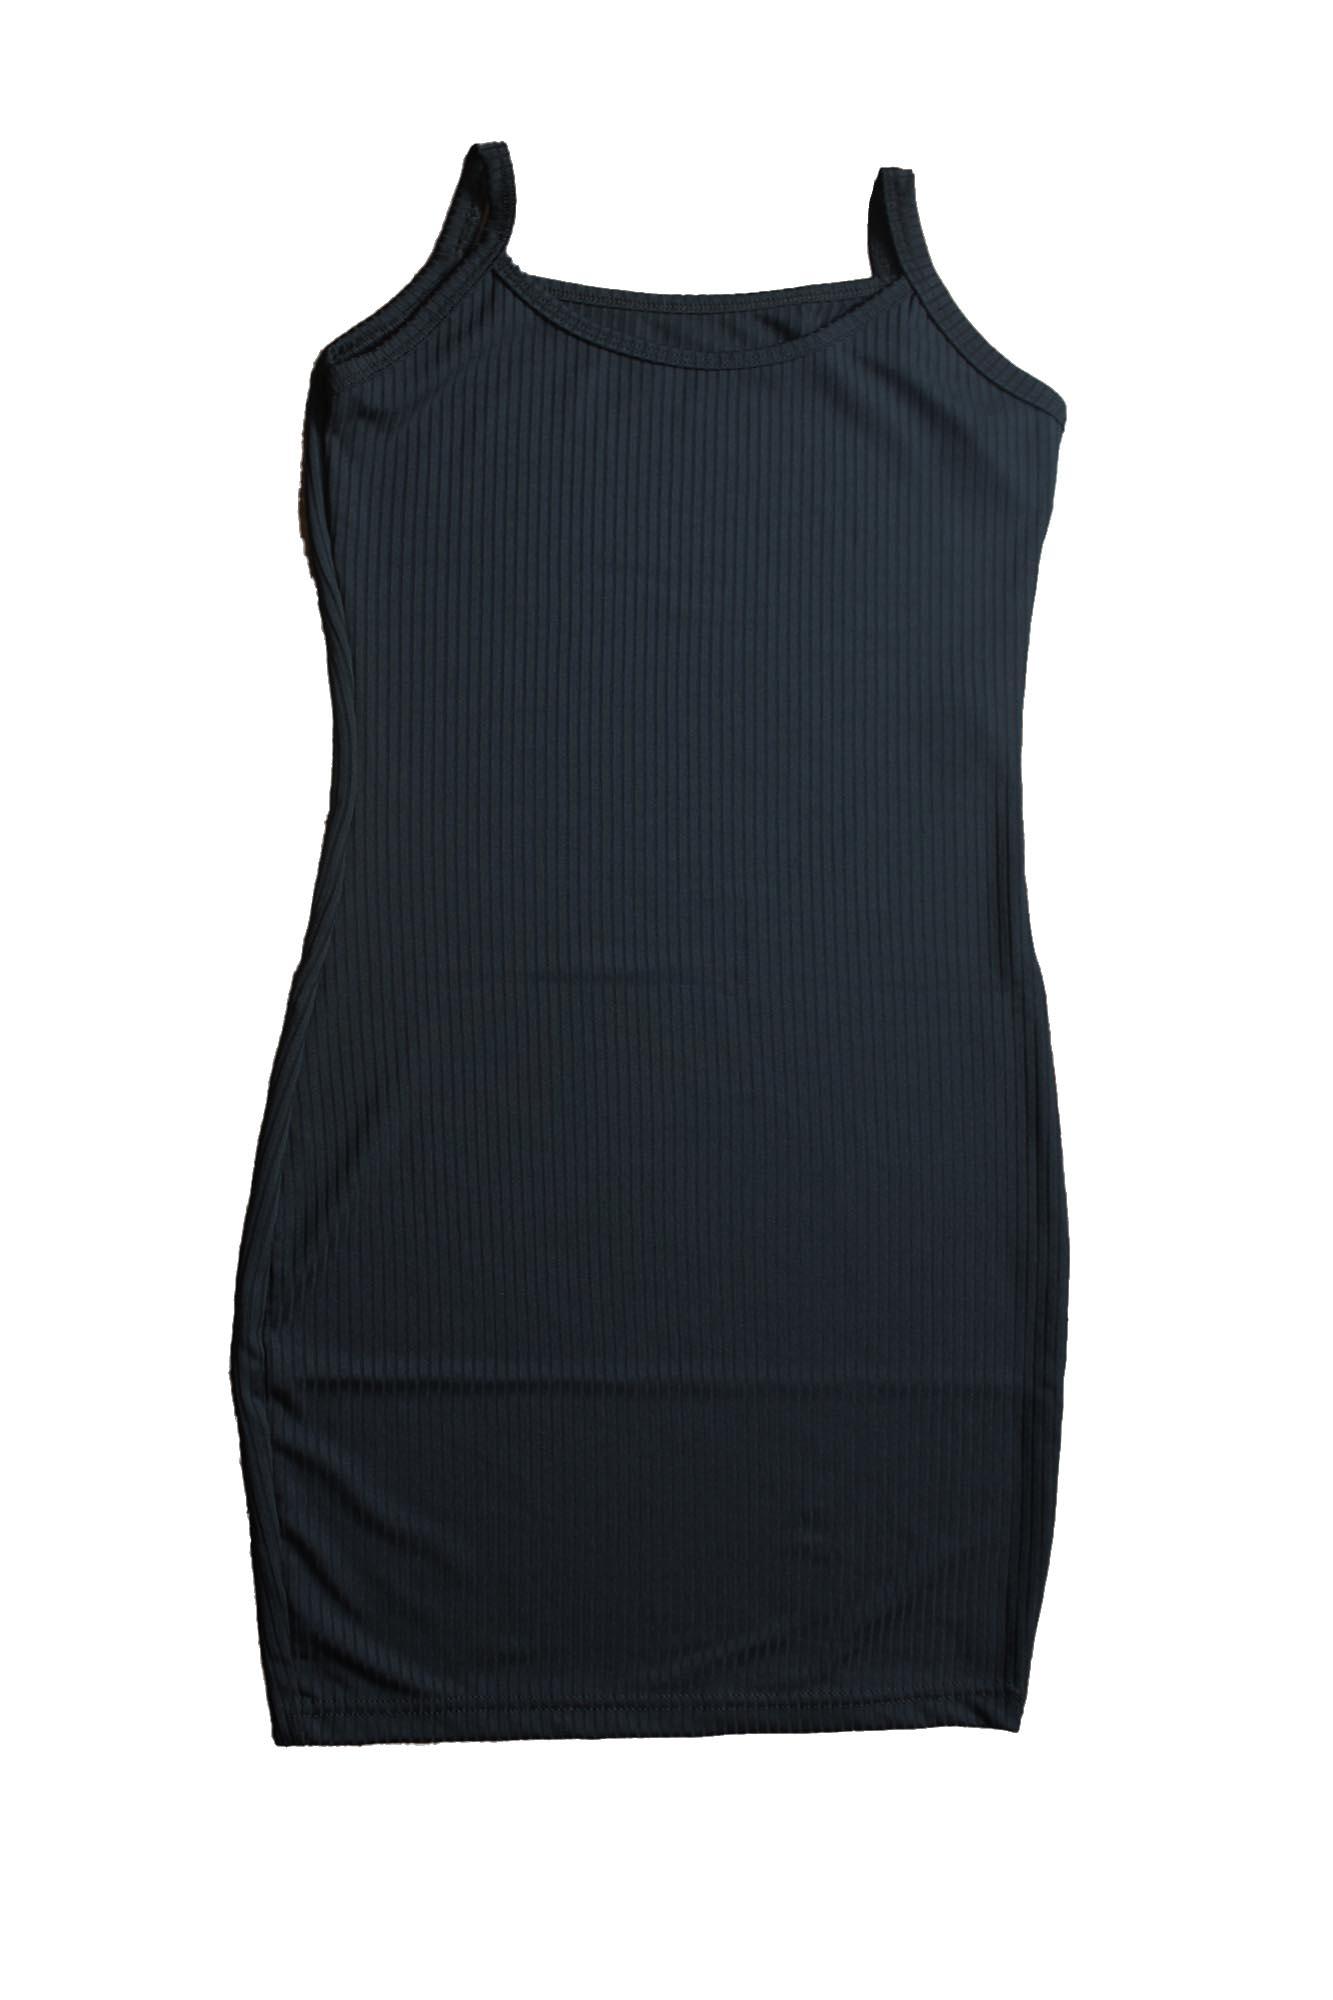 Vestido Básico Justo Sem Manga Feminino - Preto